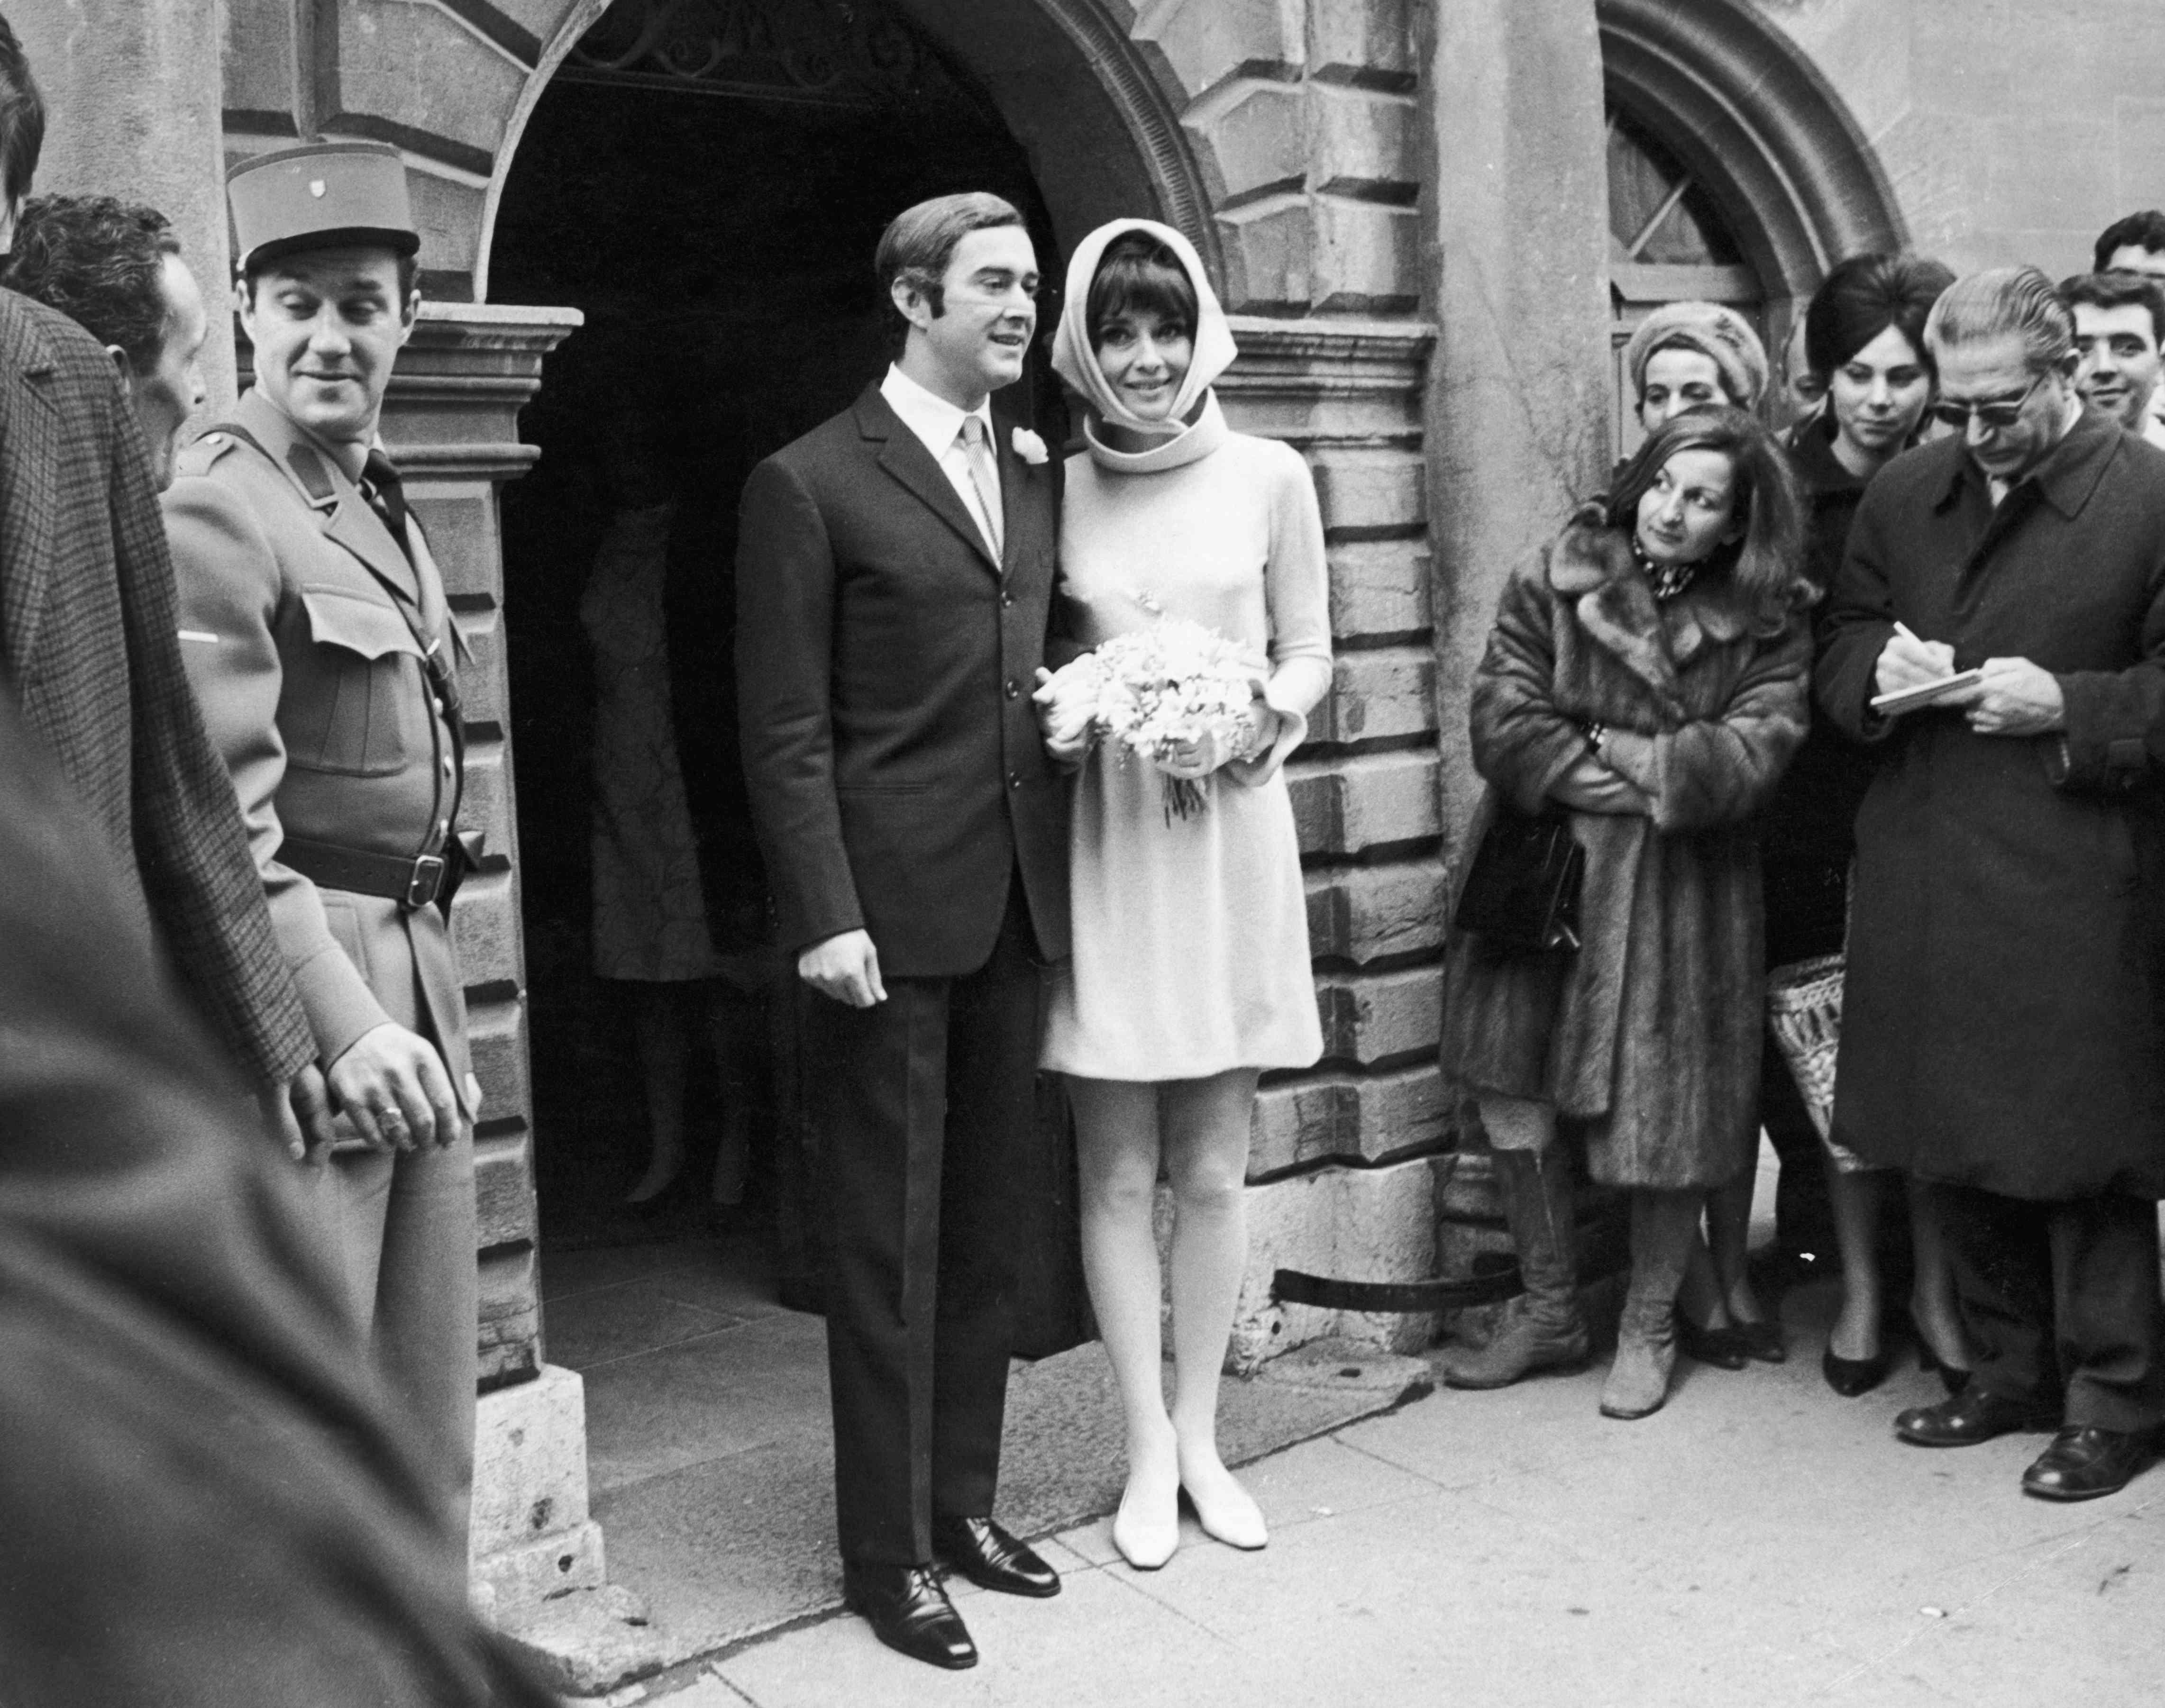 Tbt Audrey Hepburn S 3 Wedding Dresses,Royal Hindu Indian Wedding Dresses For Men